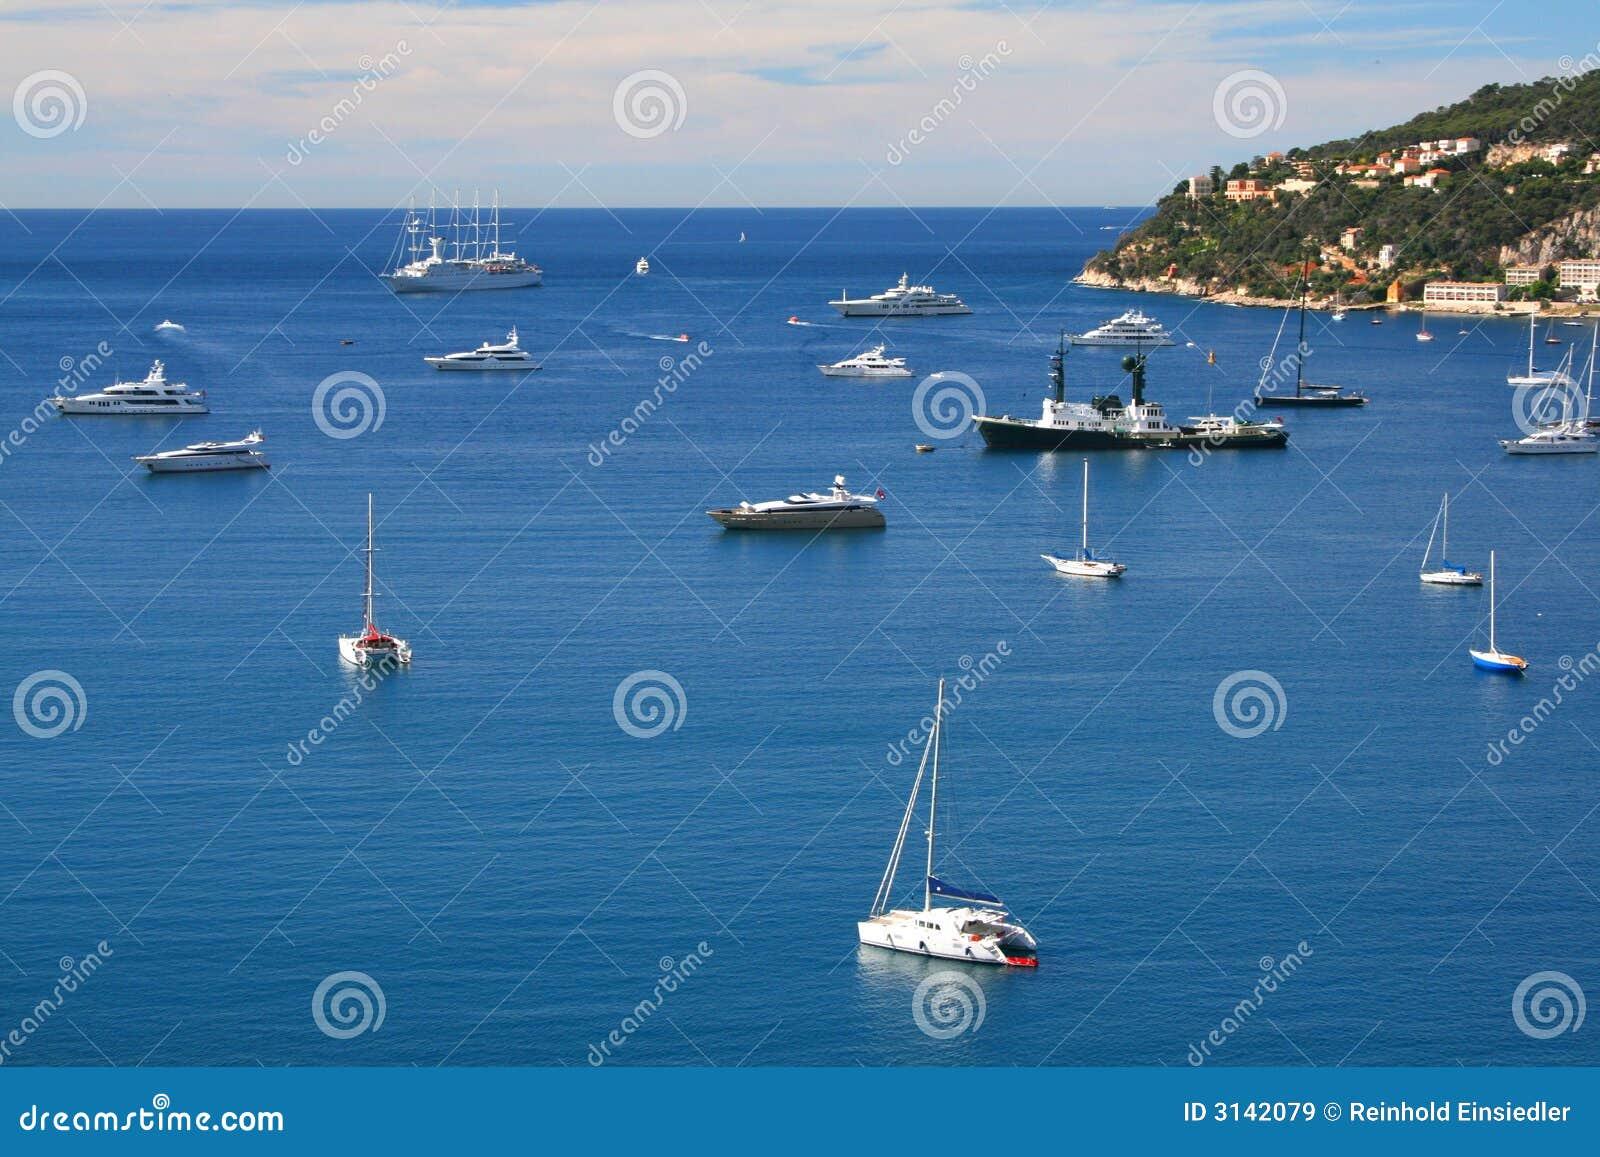 Villefranche-s-Mer